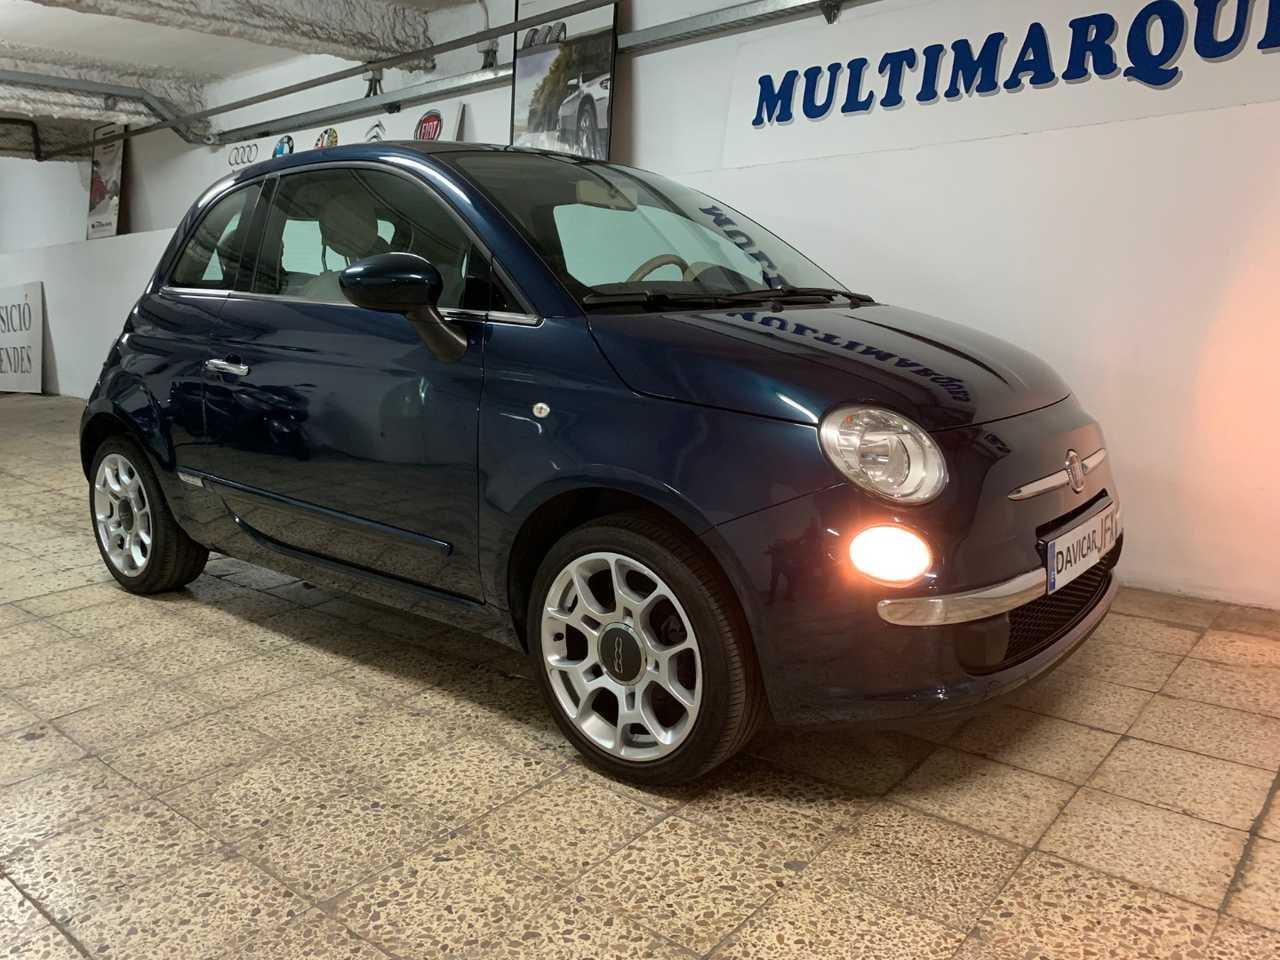 Fiat 500 1.2 LOUNGE IMPECABLE FINANCIACION AL 6,95%  - Foto 1